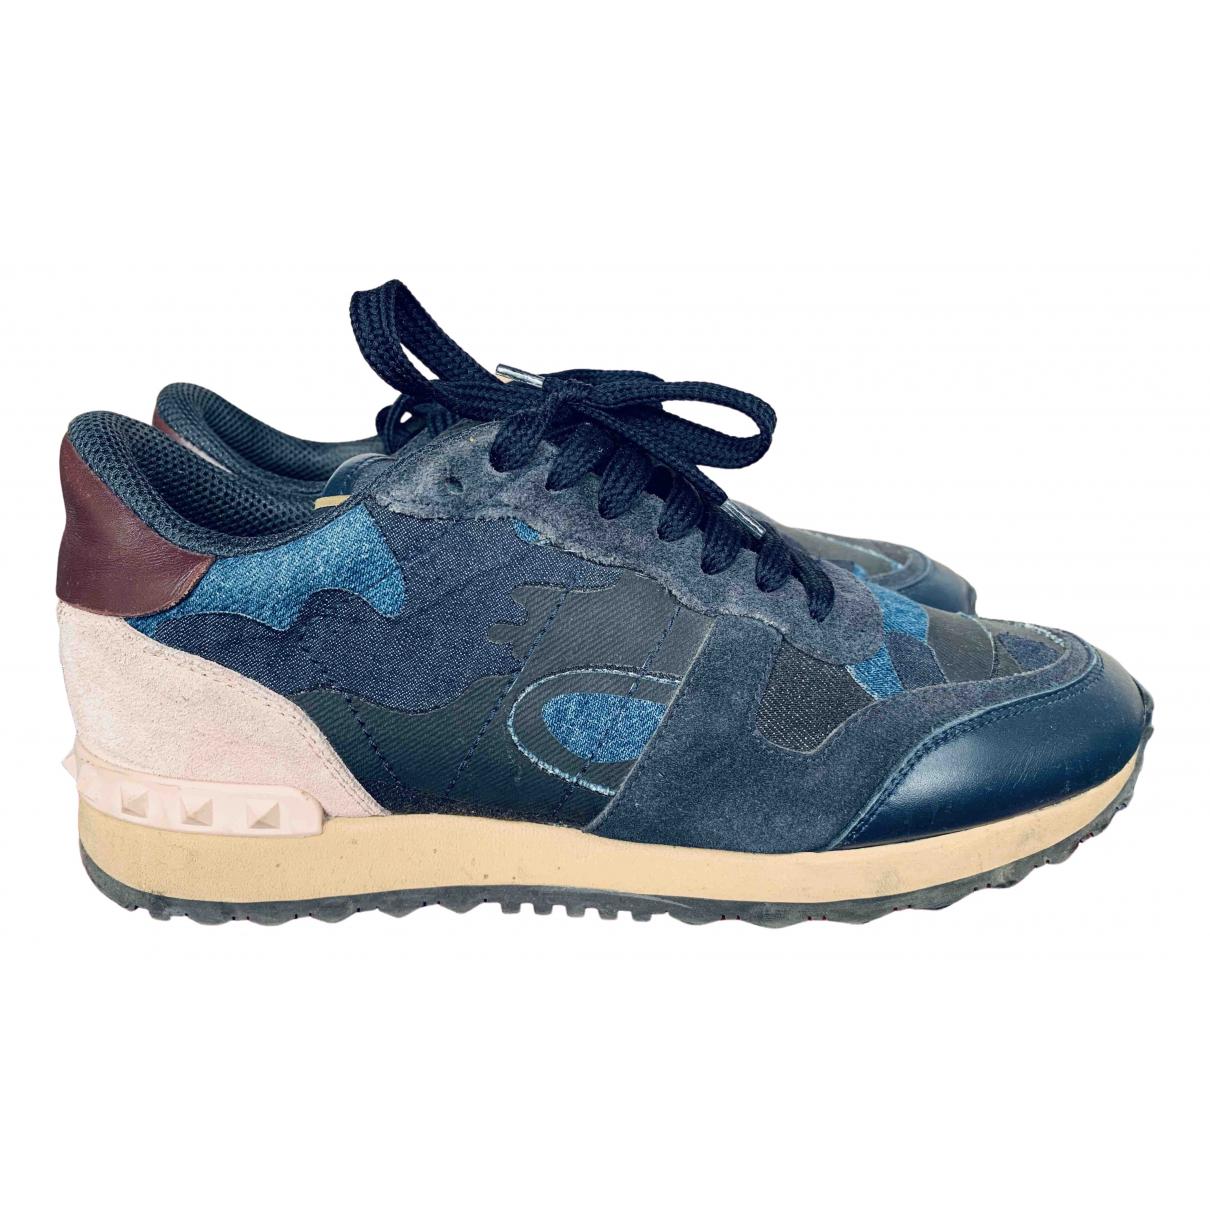 Valentino Garavani Rockrunner Blue Leather Trainers for Women 40 EU